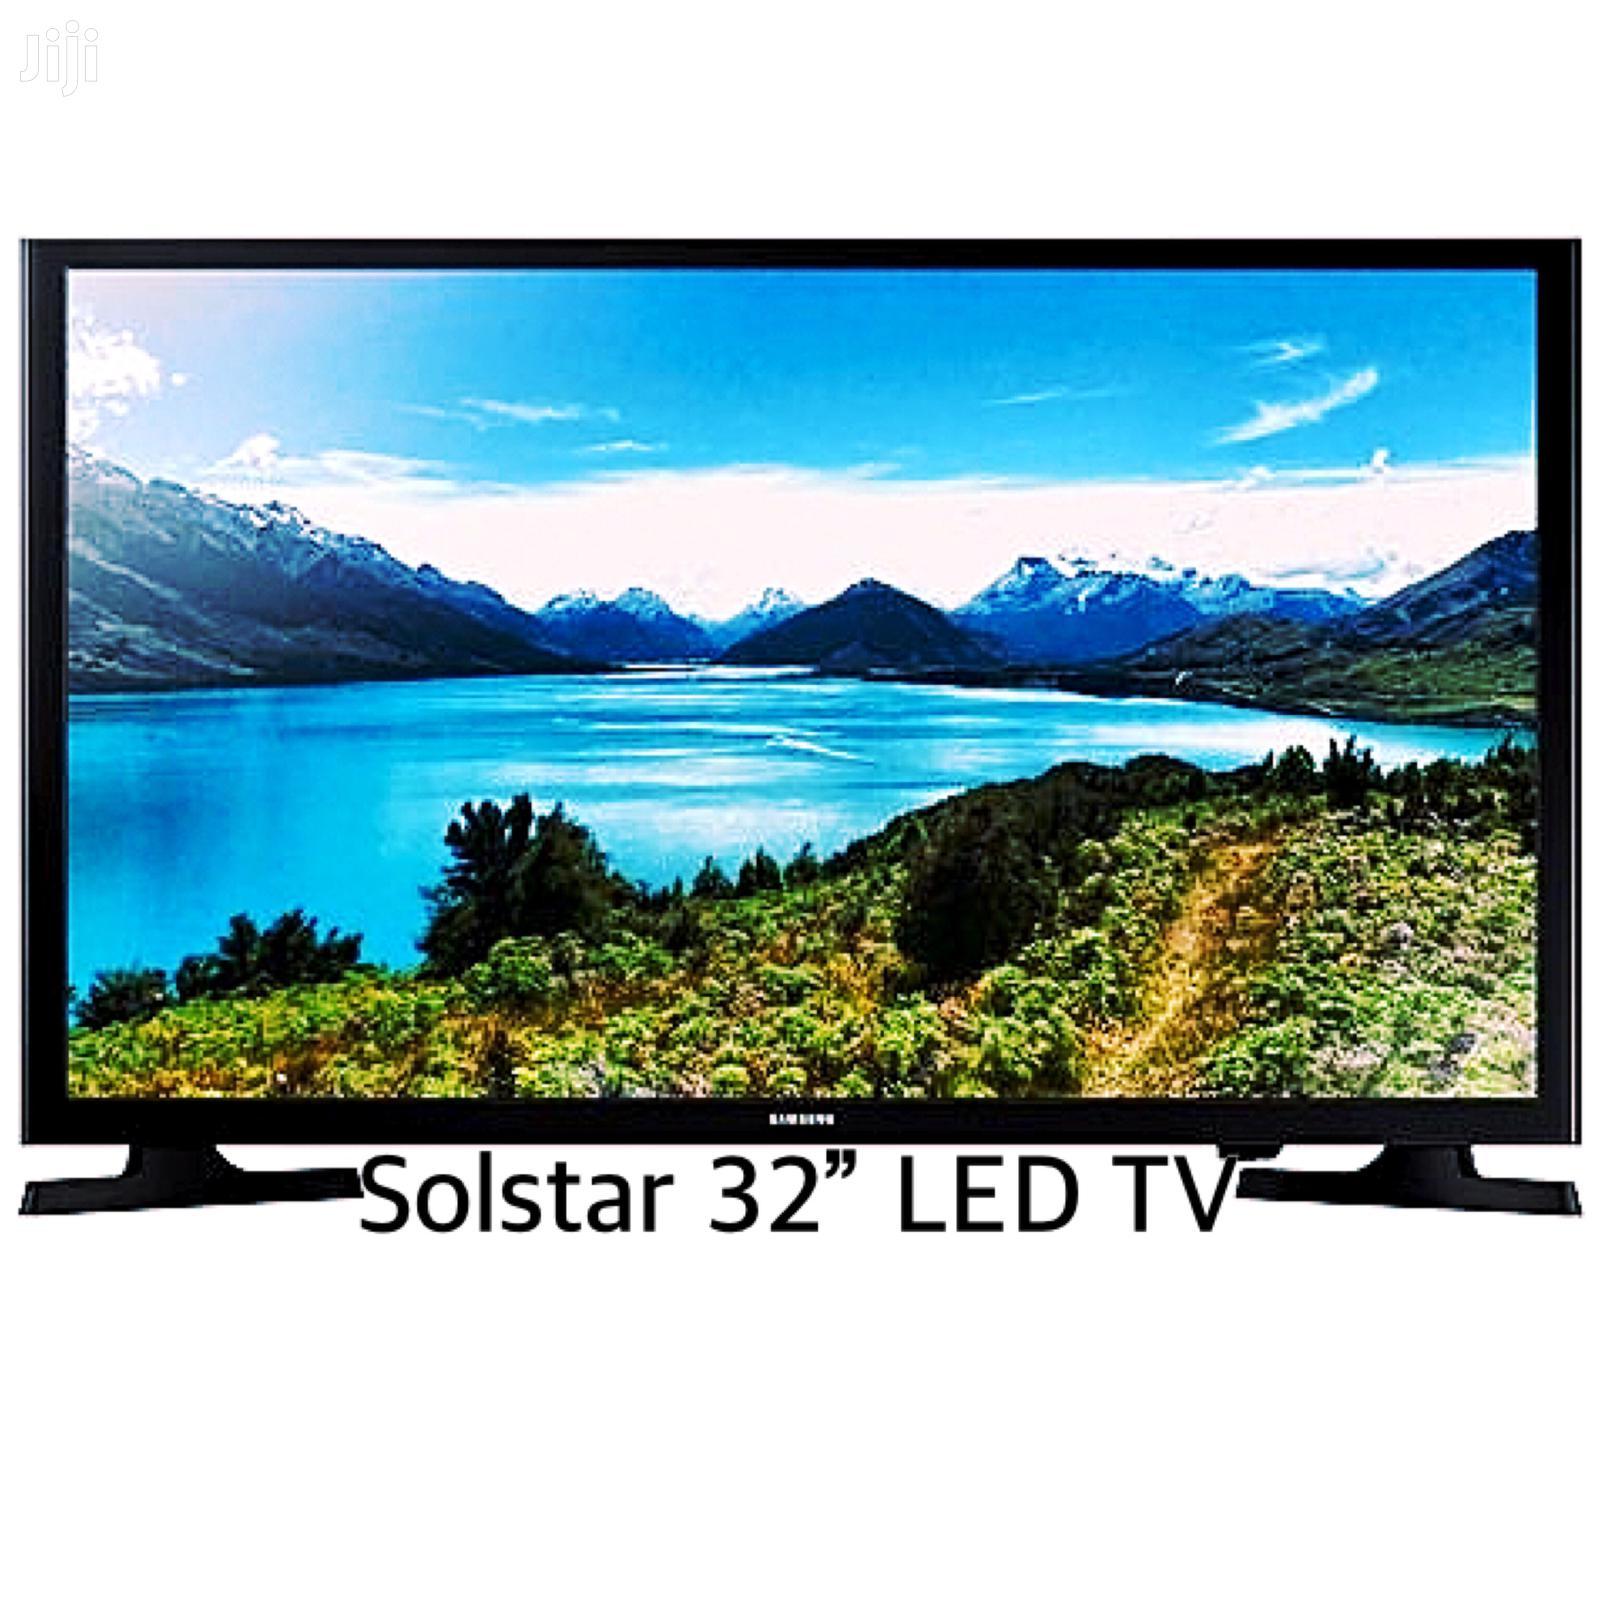 "Archive: Solstar 32"" LED TV"